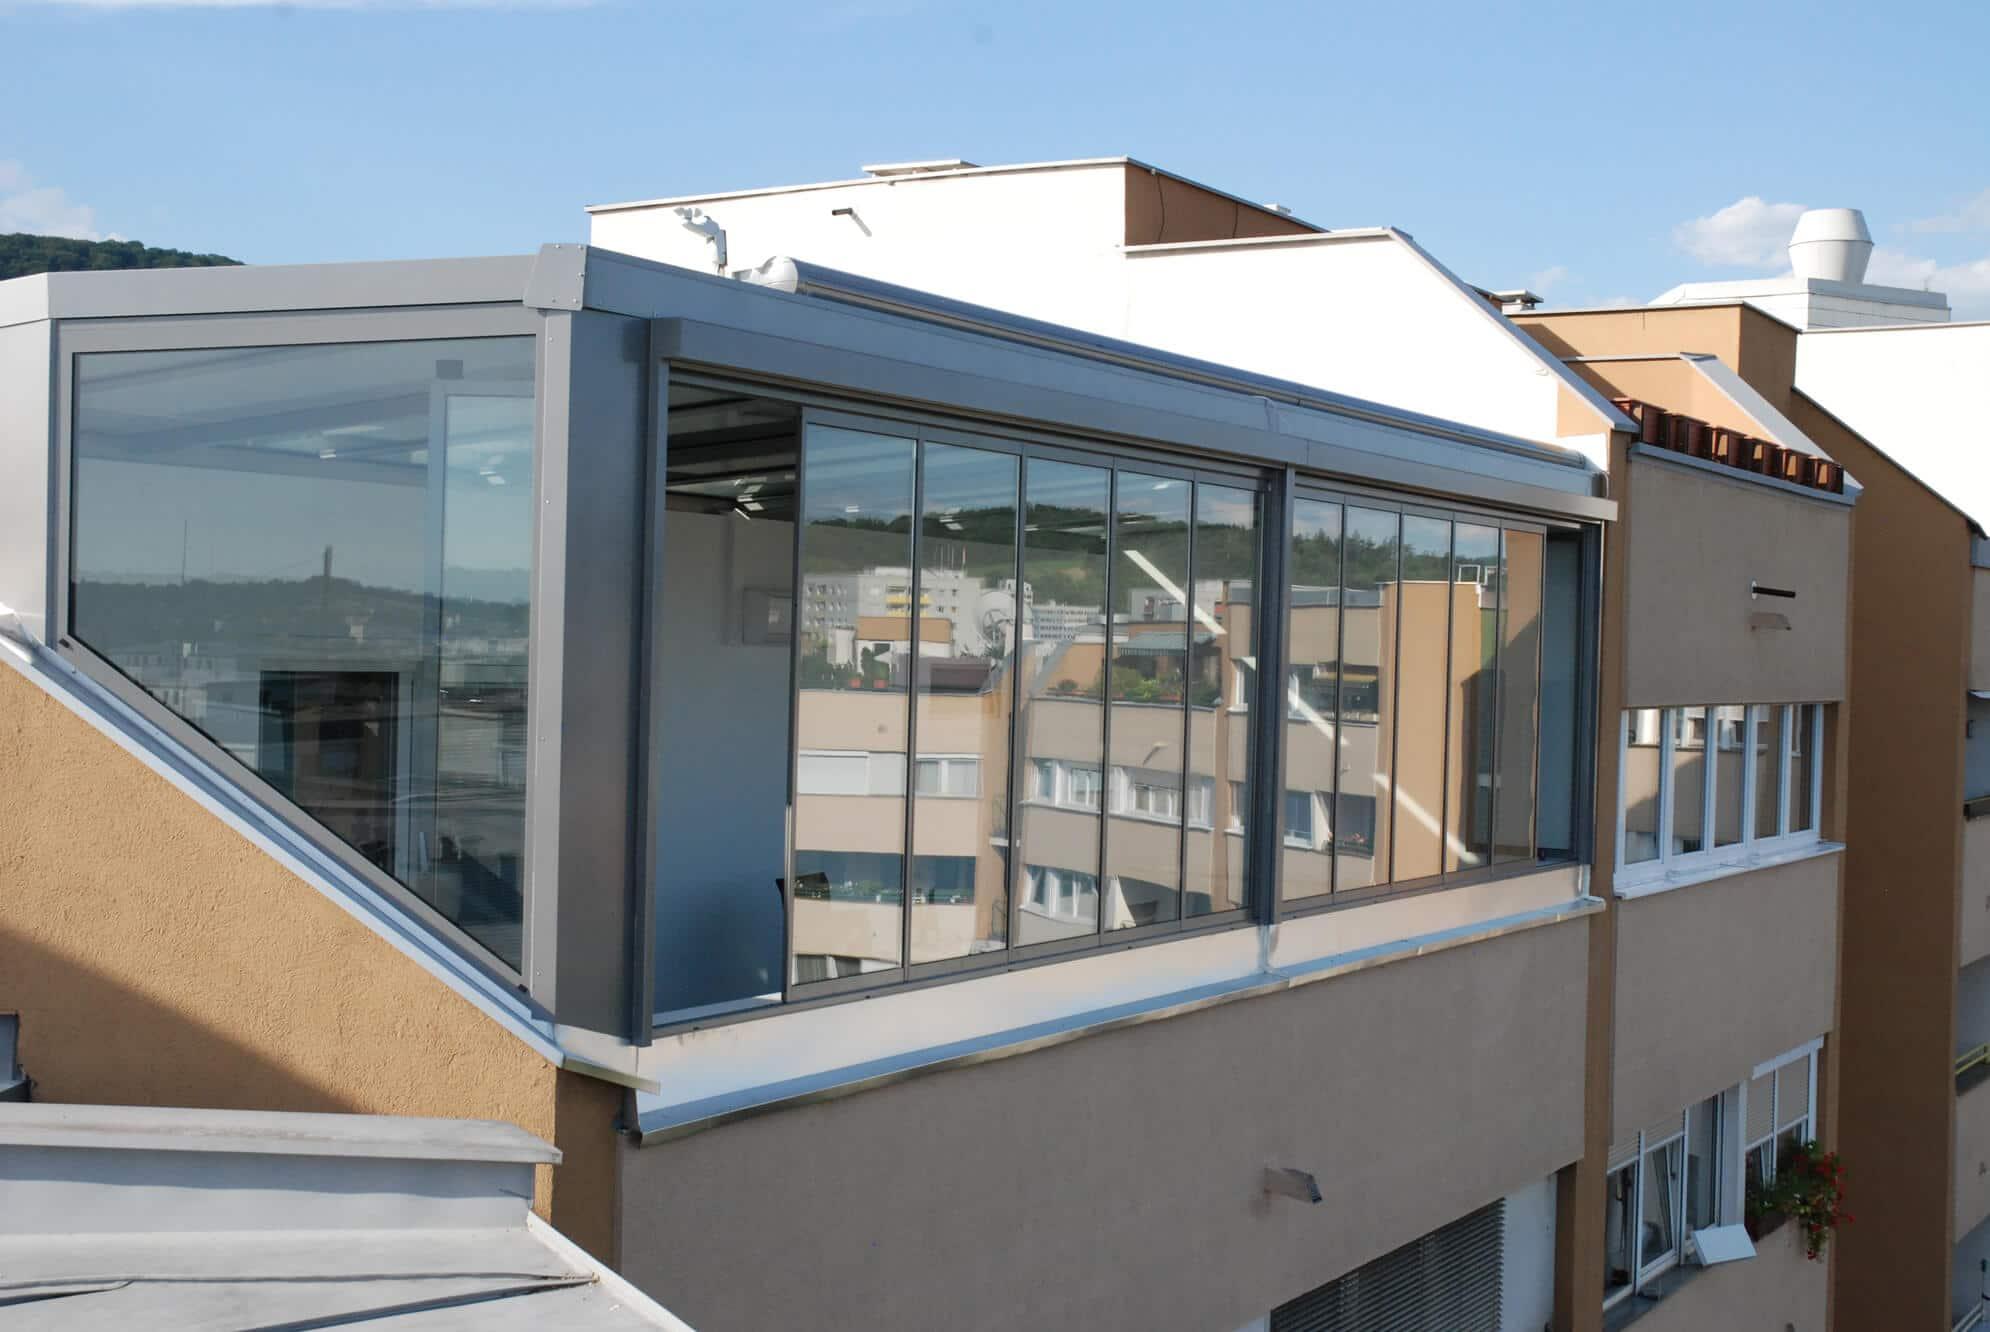 berdachung terrasse mit windschutz wintergarten schmidinger. Black Bedroom Furniture Sets. Home Design Ideas